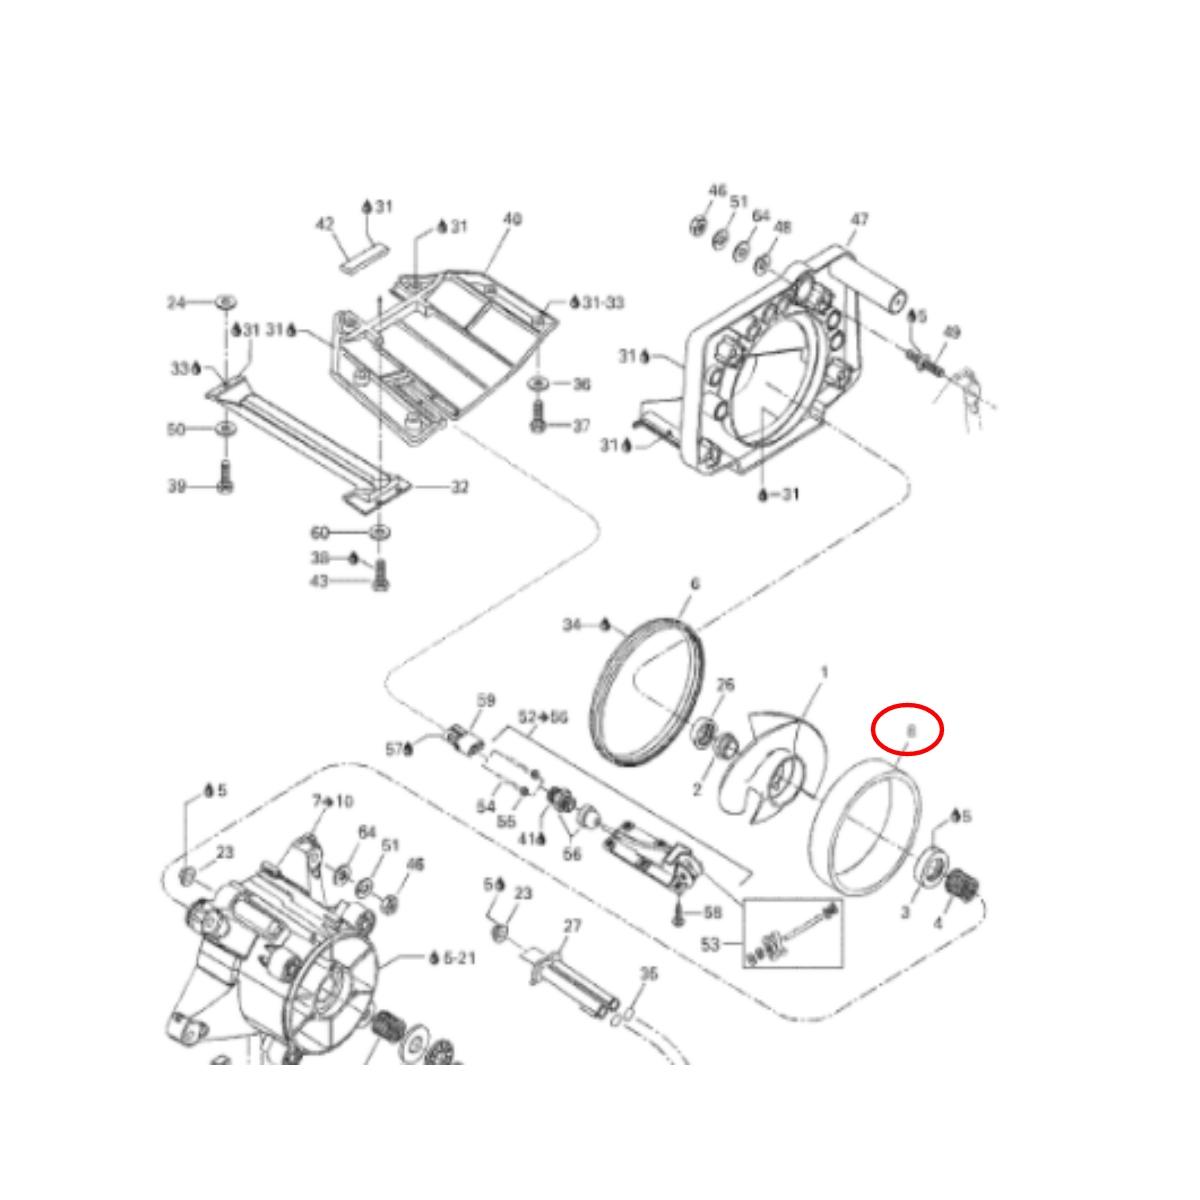 Cinta de Turbina para Jet Ski Sea Doo 580/650/720/800 STD  - Radical Peças - Peças para Jet Ski